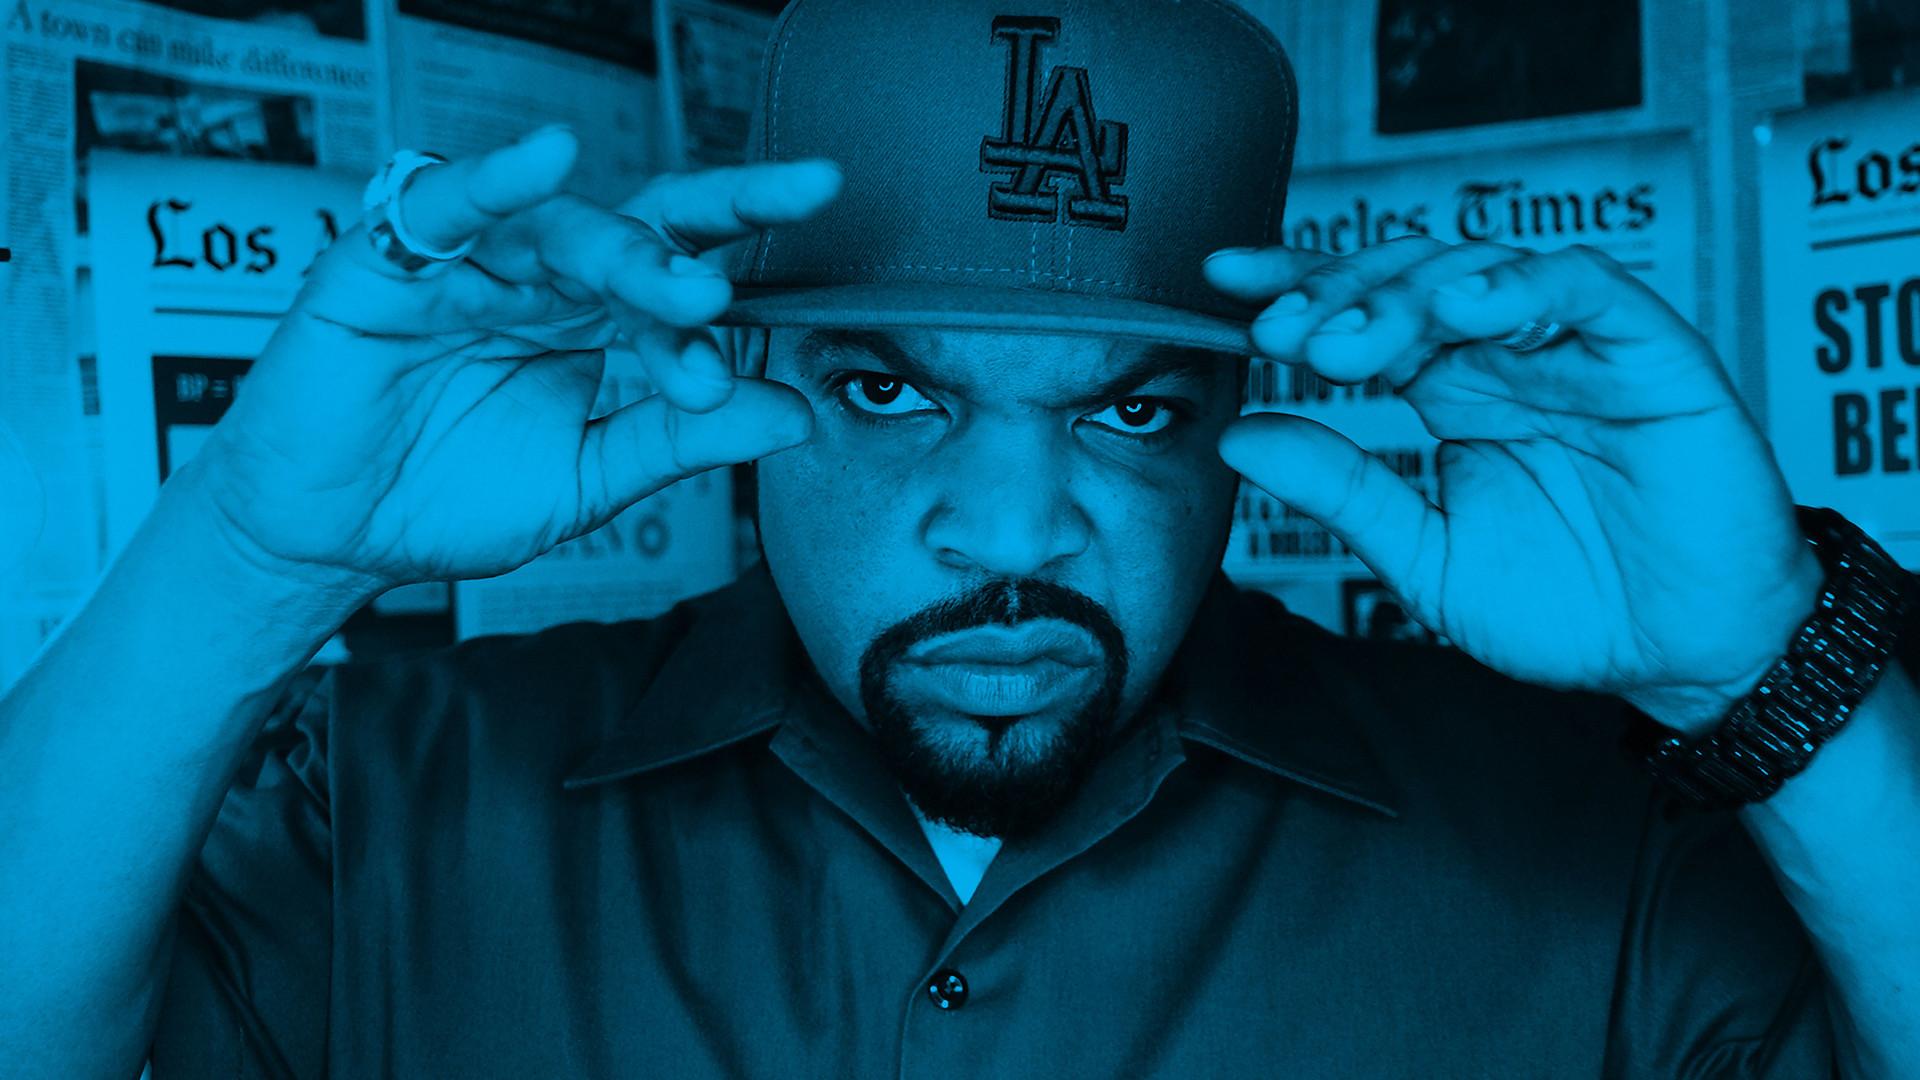 Ice Cube Wallpaper -â'